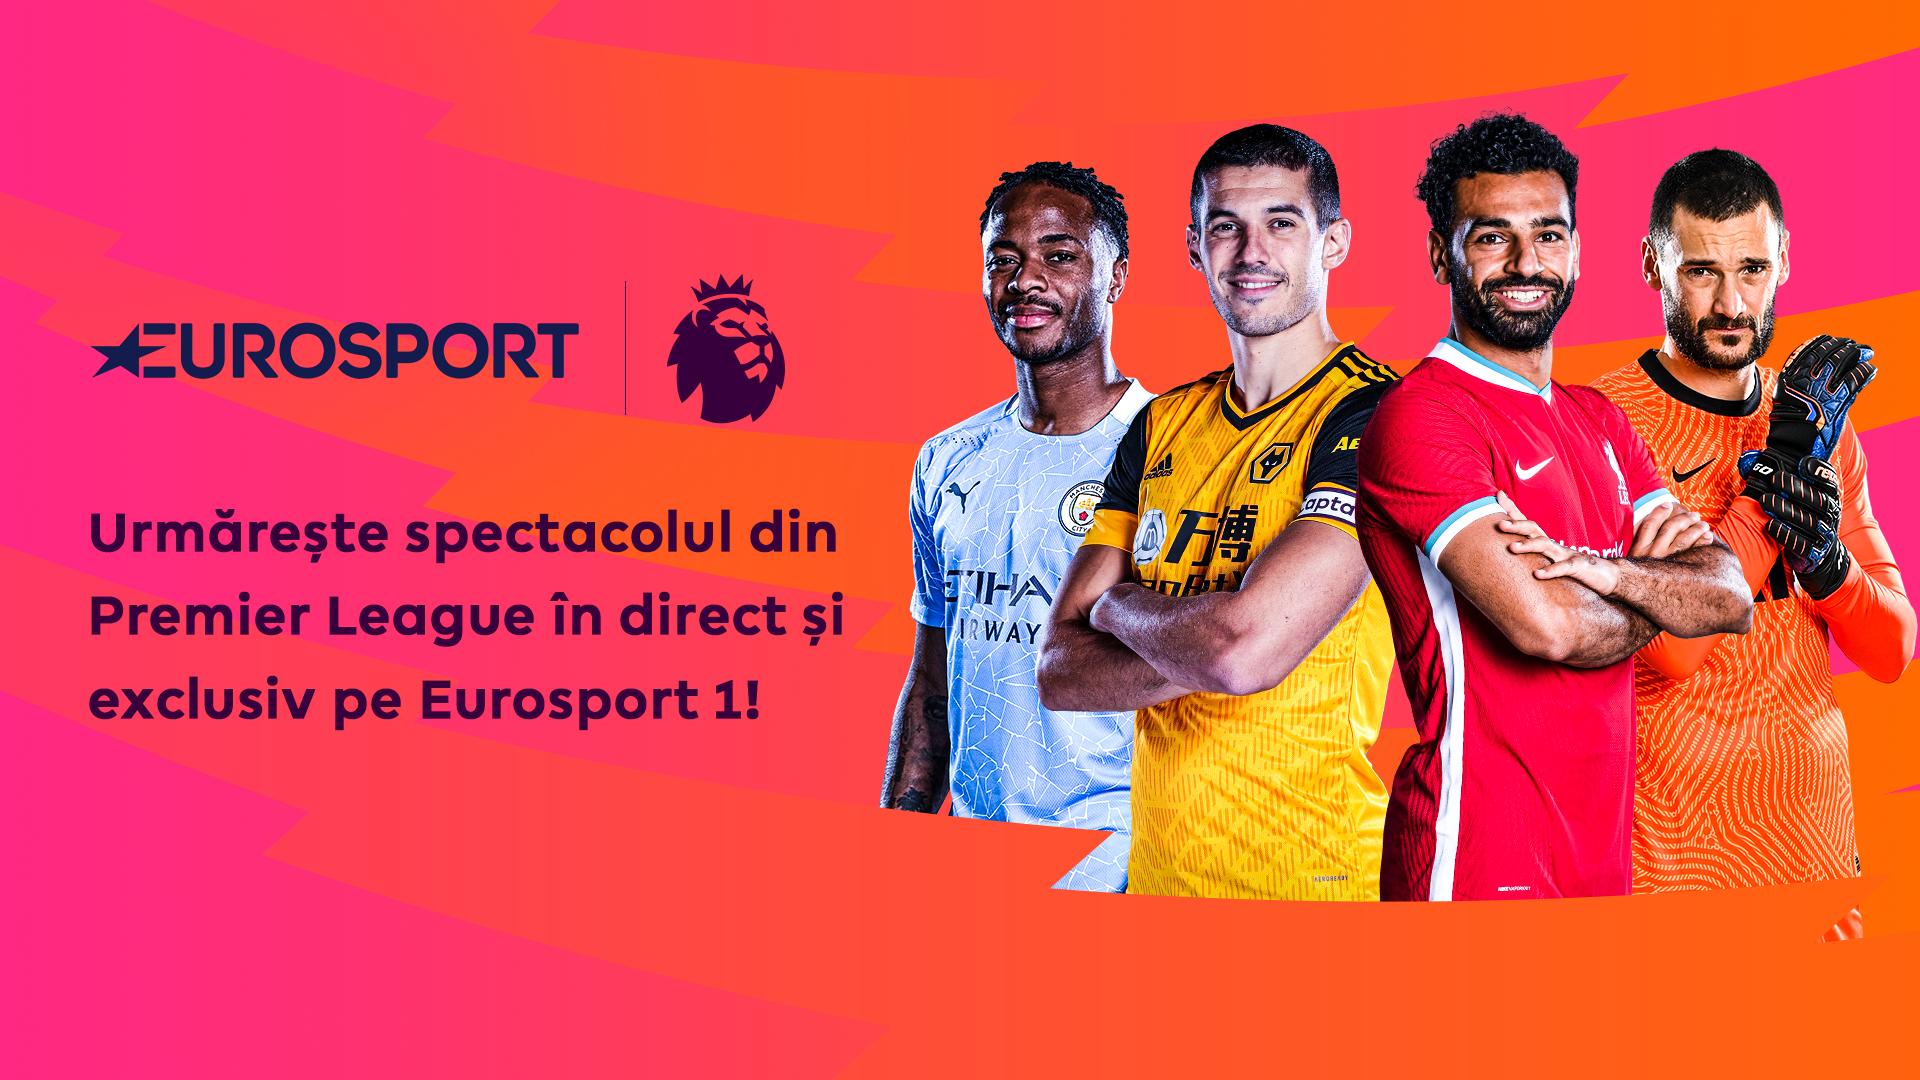 https://i.eurosport.com/2021/01/10/2968424.png